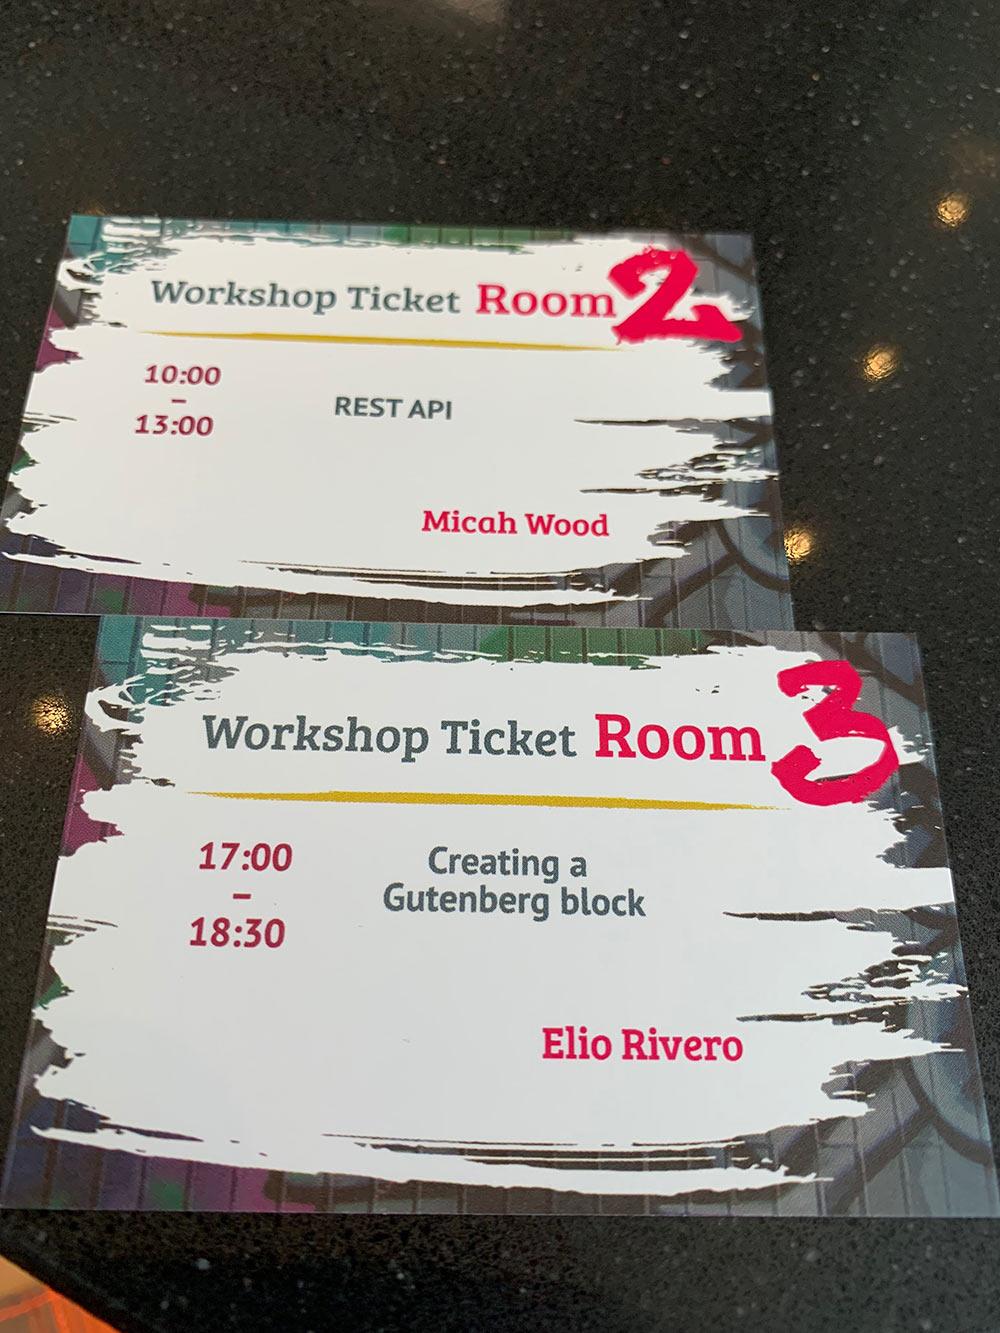 wceu 2019 day3 02 - WordCamp Europe 2019 - WordPress Konferenz – Tag 3 meines #InfluencerReisli